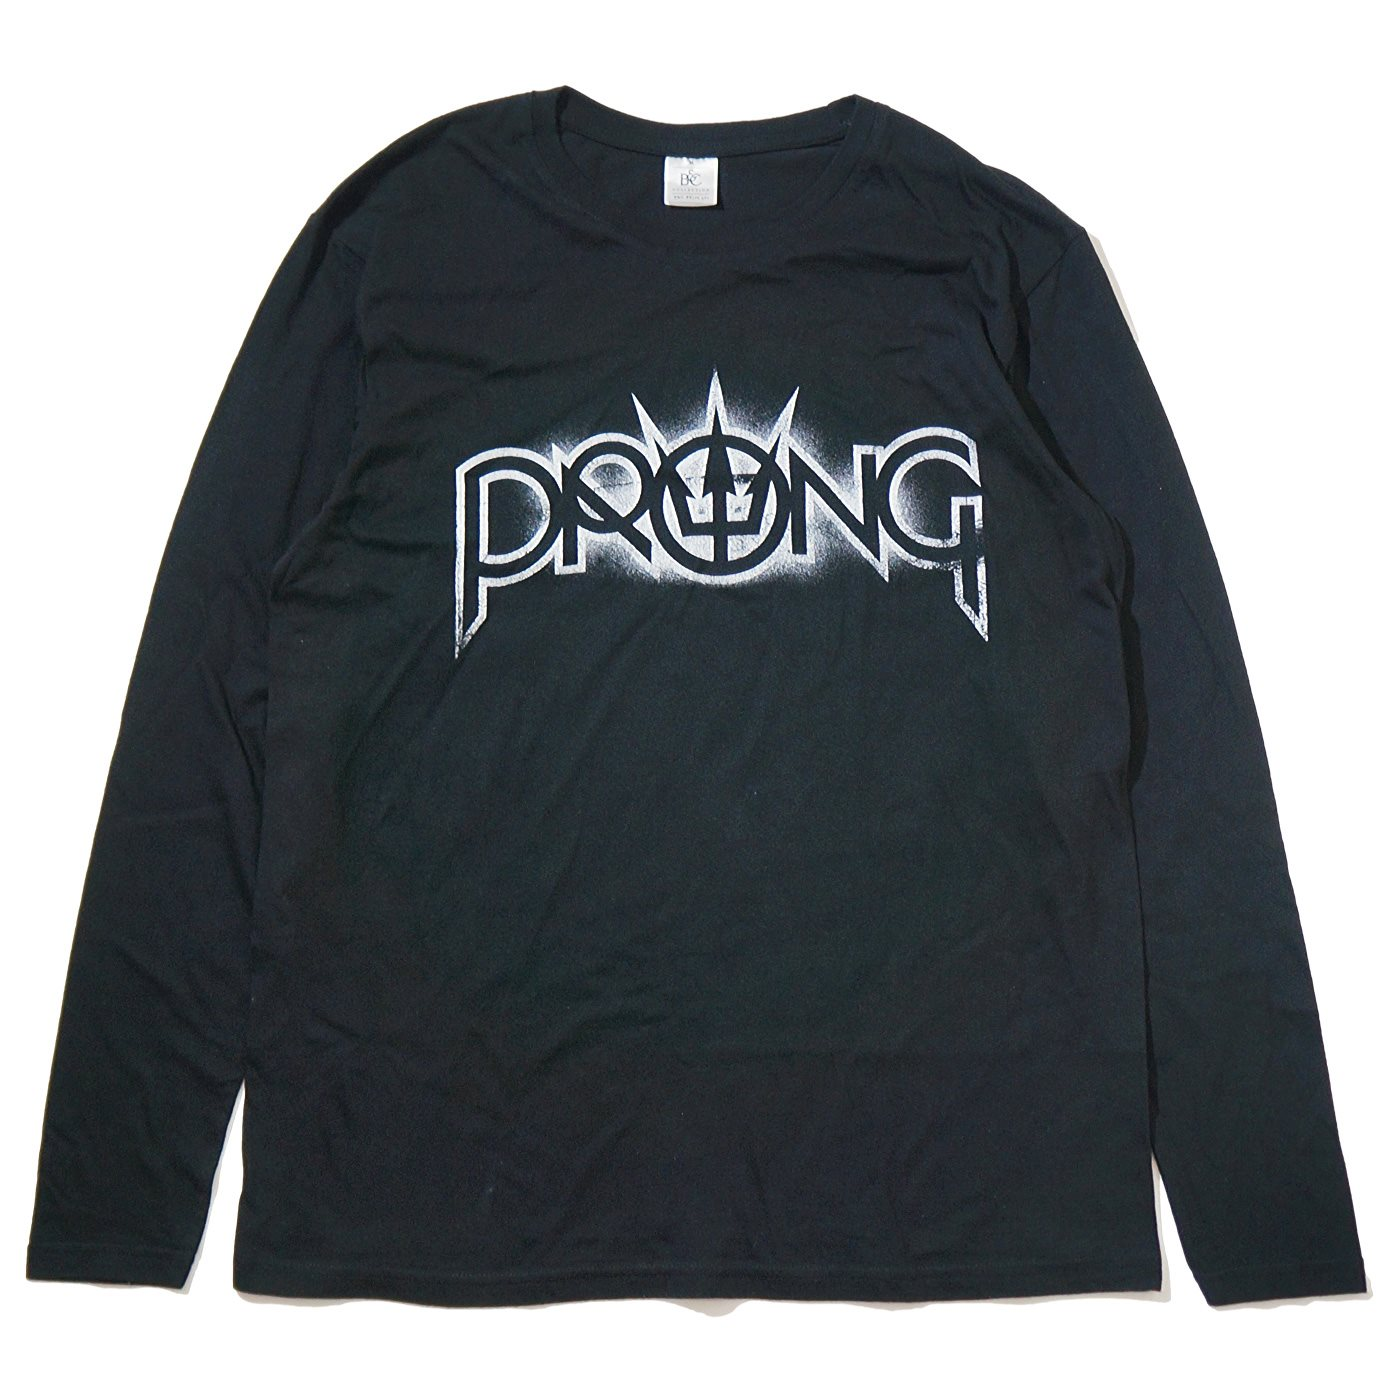 PRONG ロングスリーブTシャツ White Logo-Black